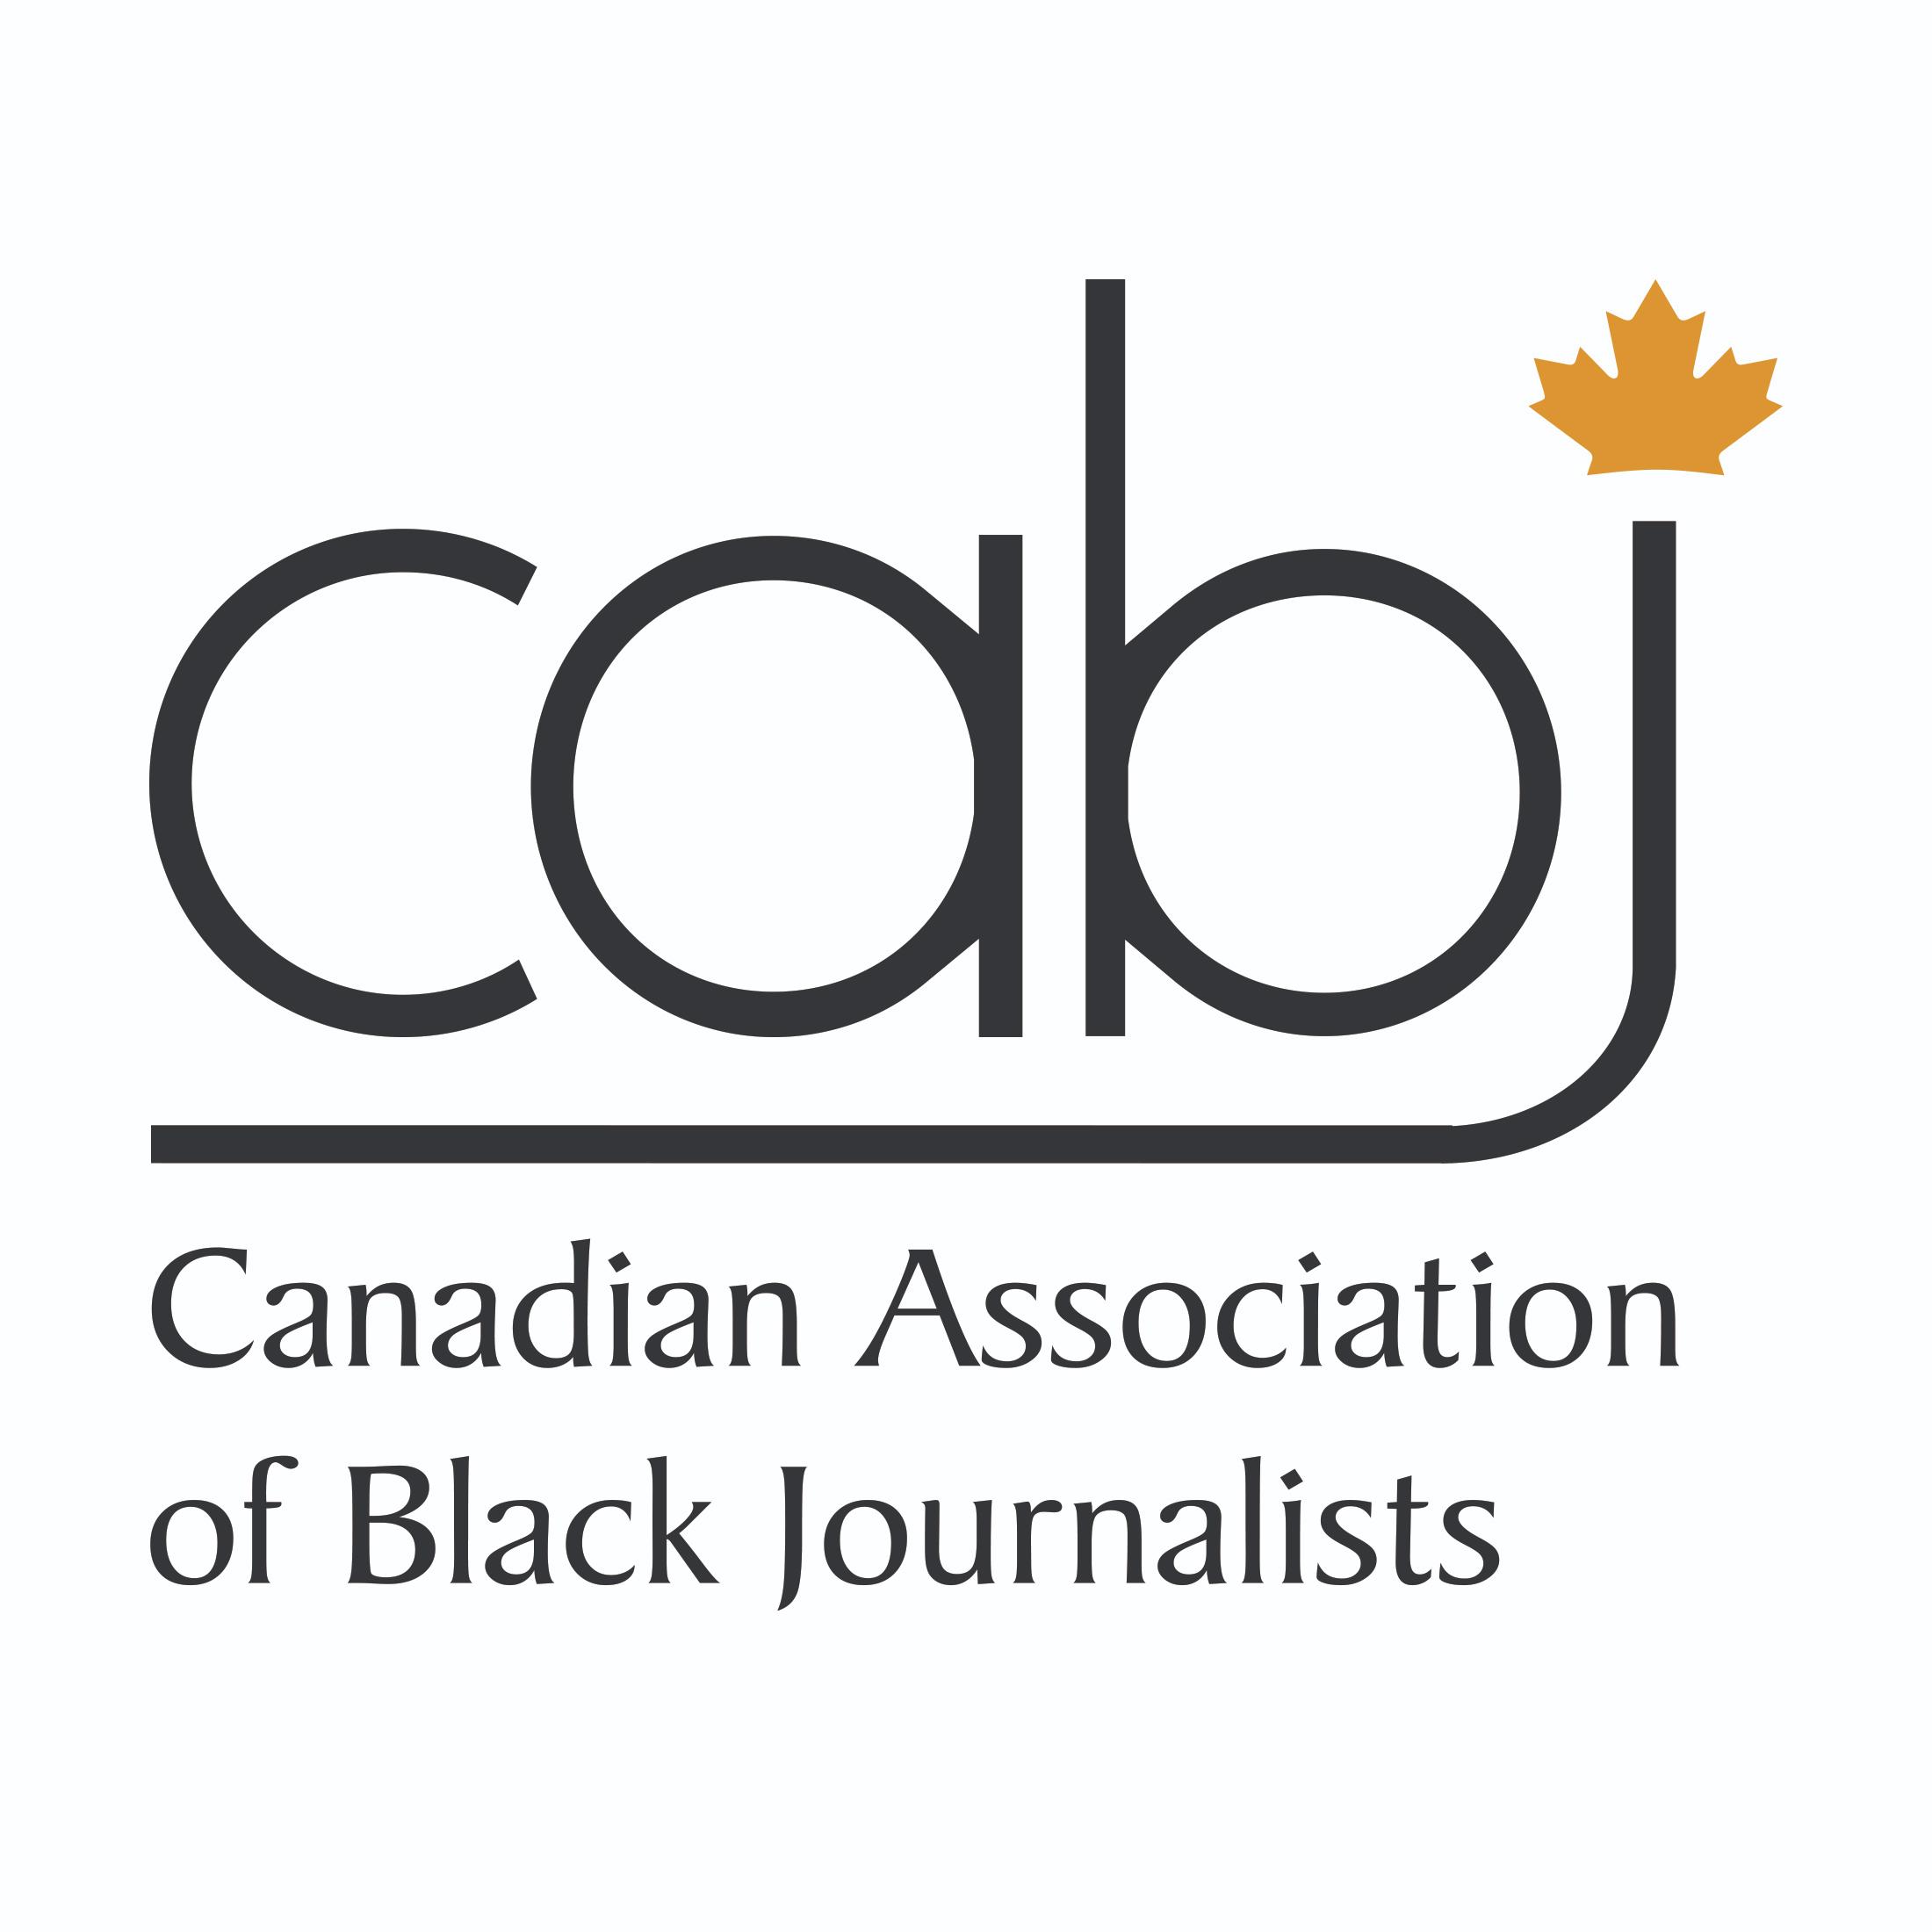 Canadian Association of Black Journalists logo